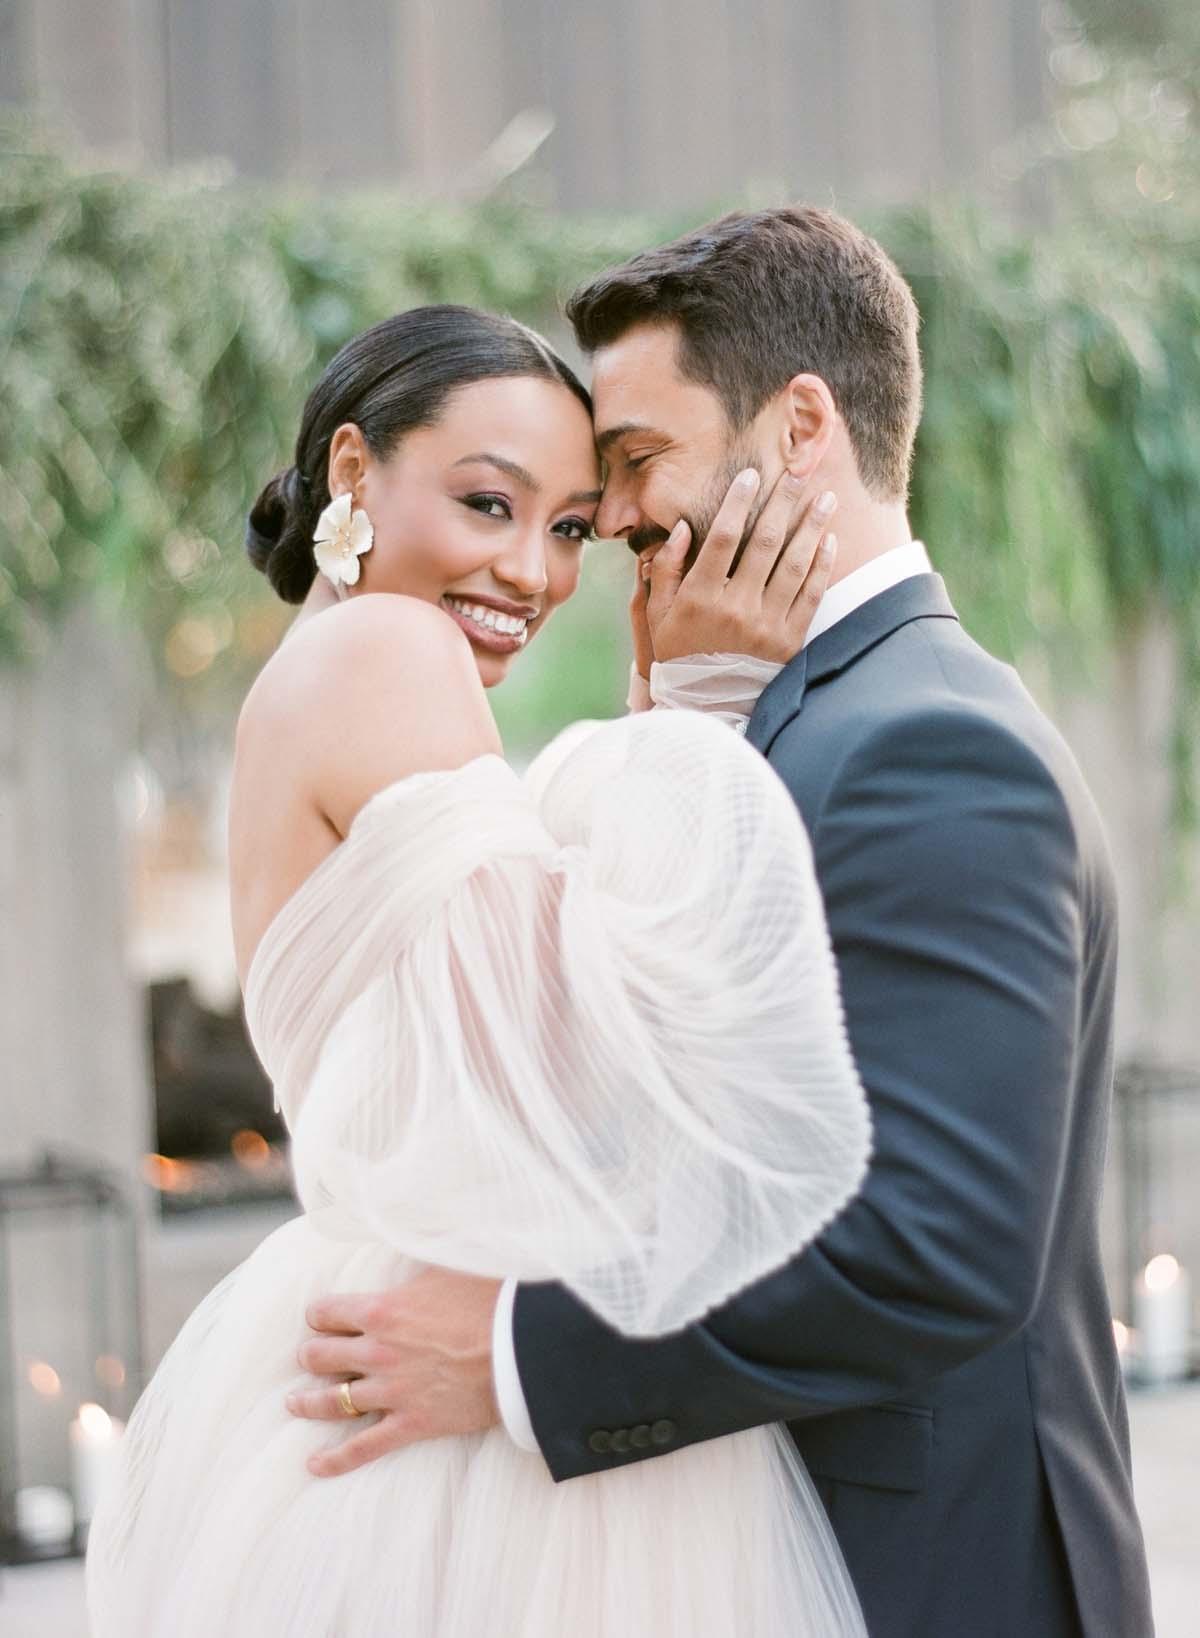 XOXO_BRIDE_Events-Michelle-Beller_Photography_0126